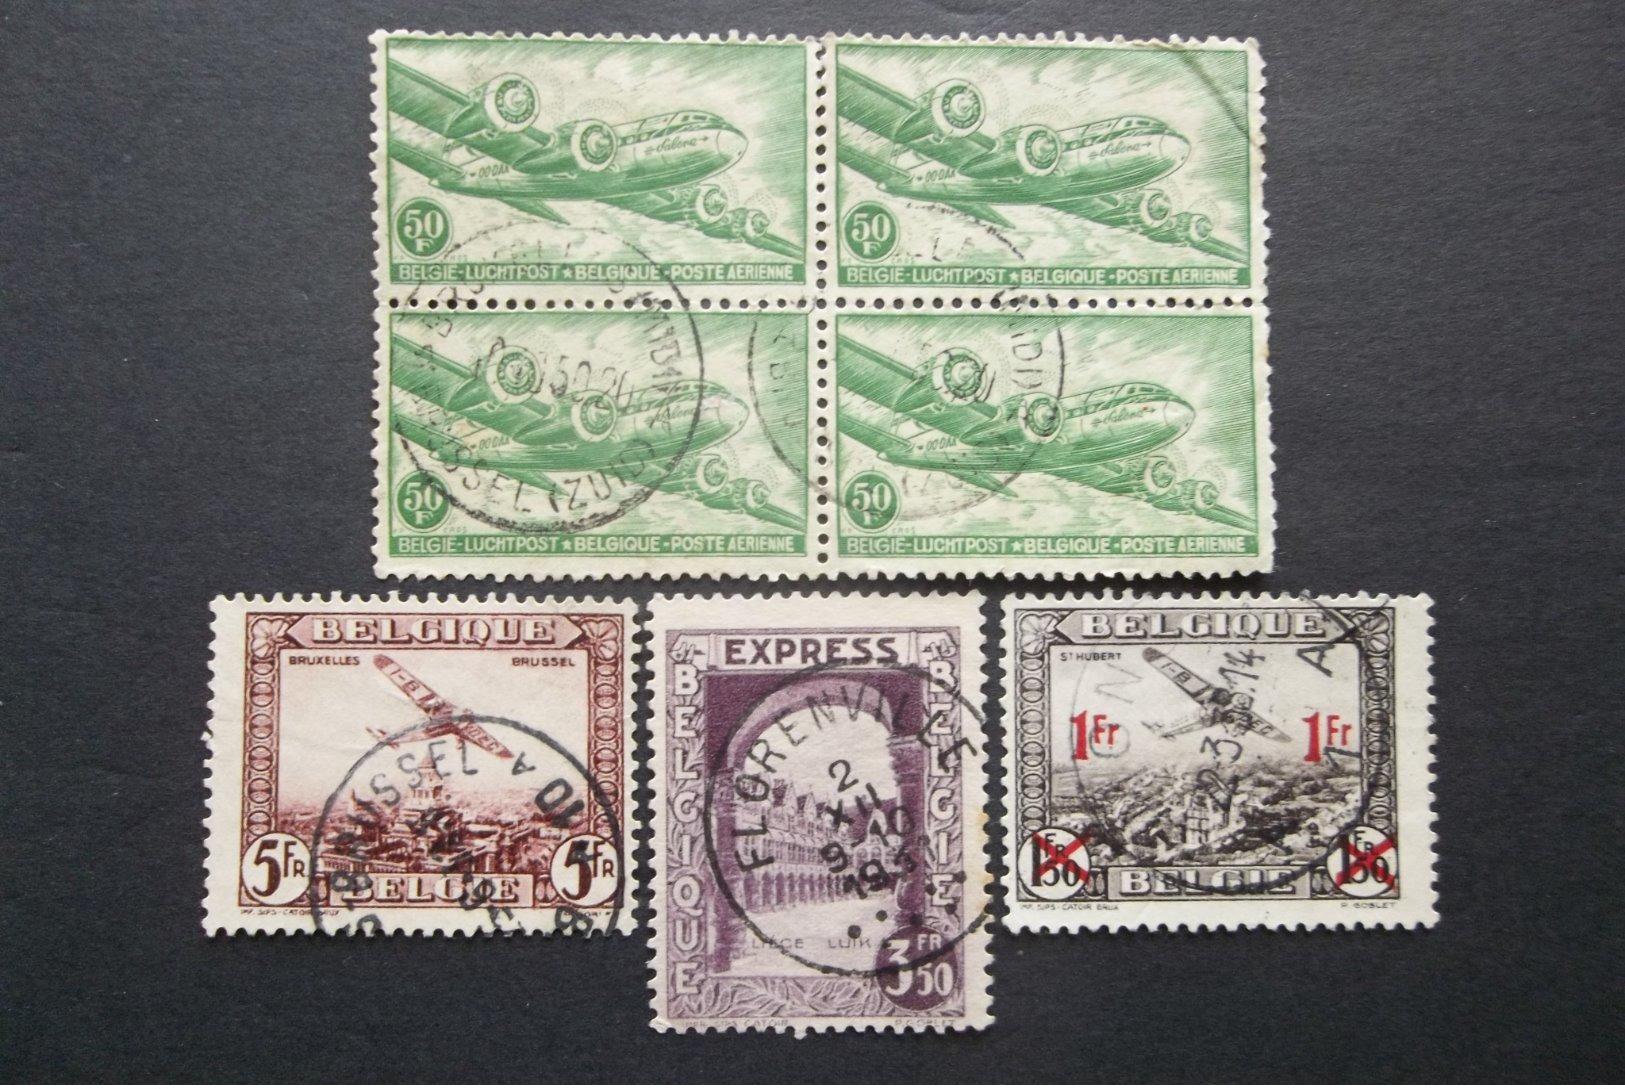 Belgique-Belgie: Various Stamps In Used (#GU7) - Belgium